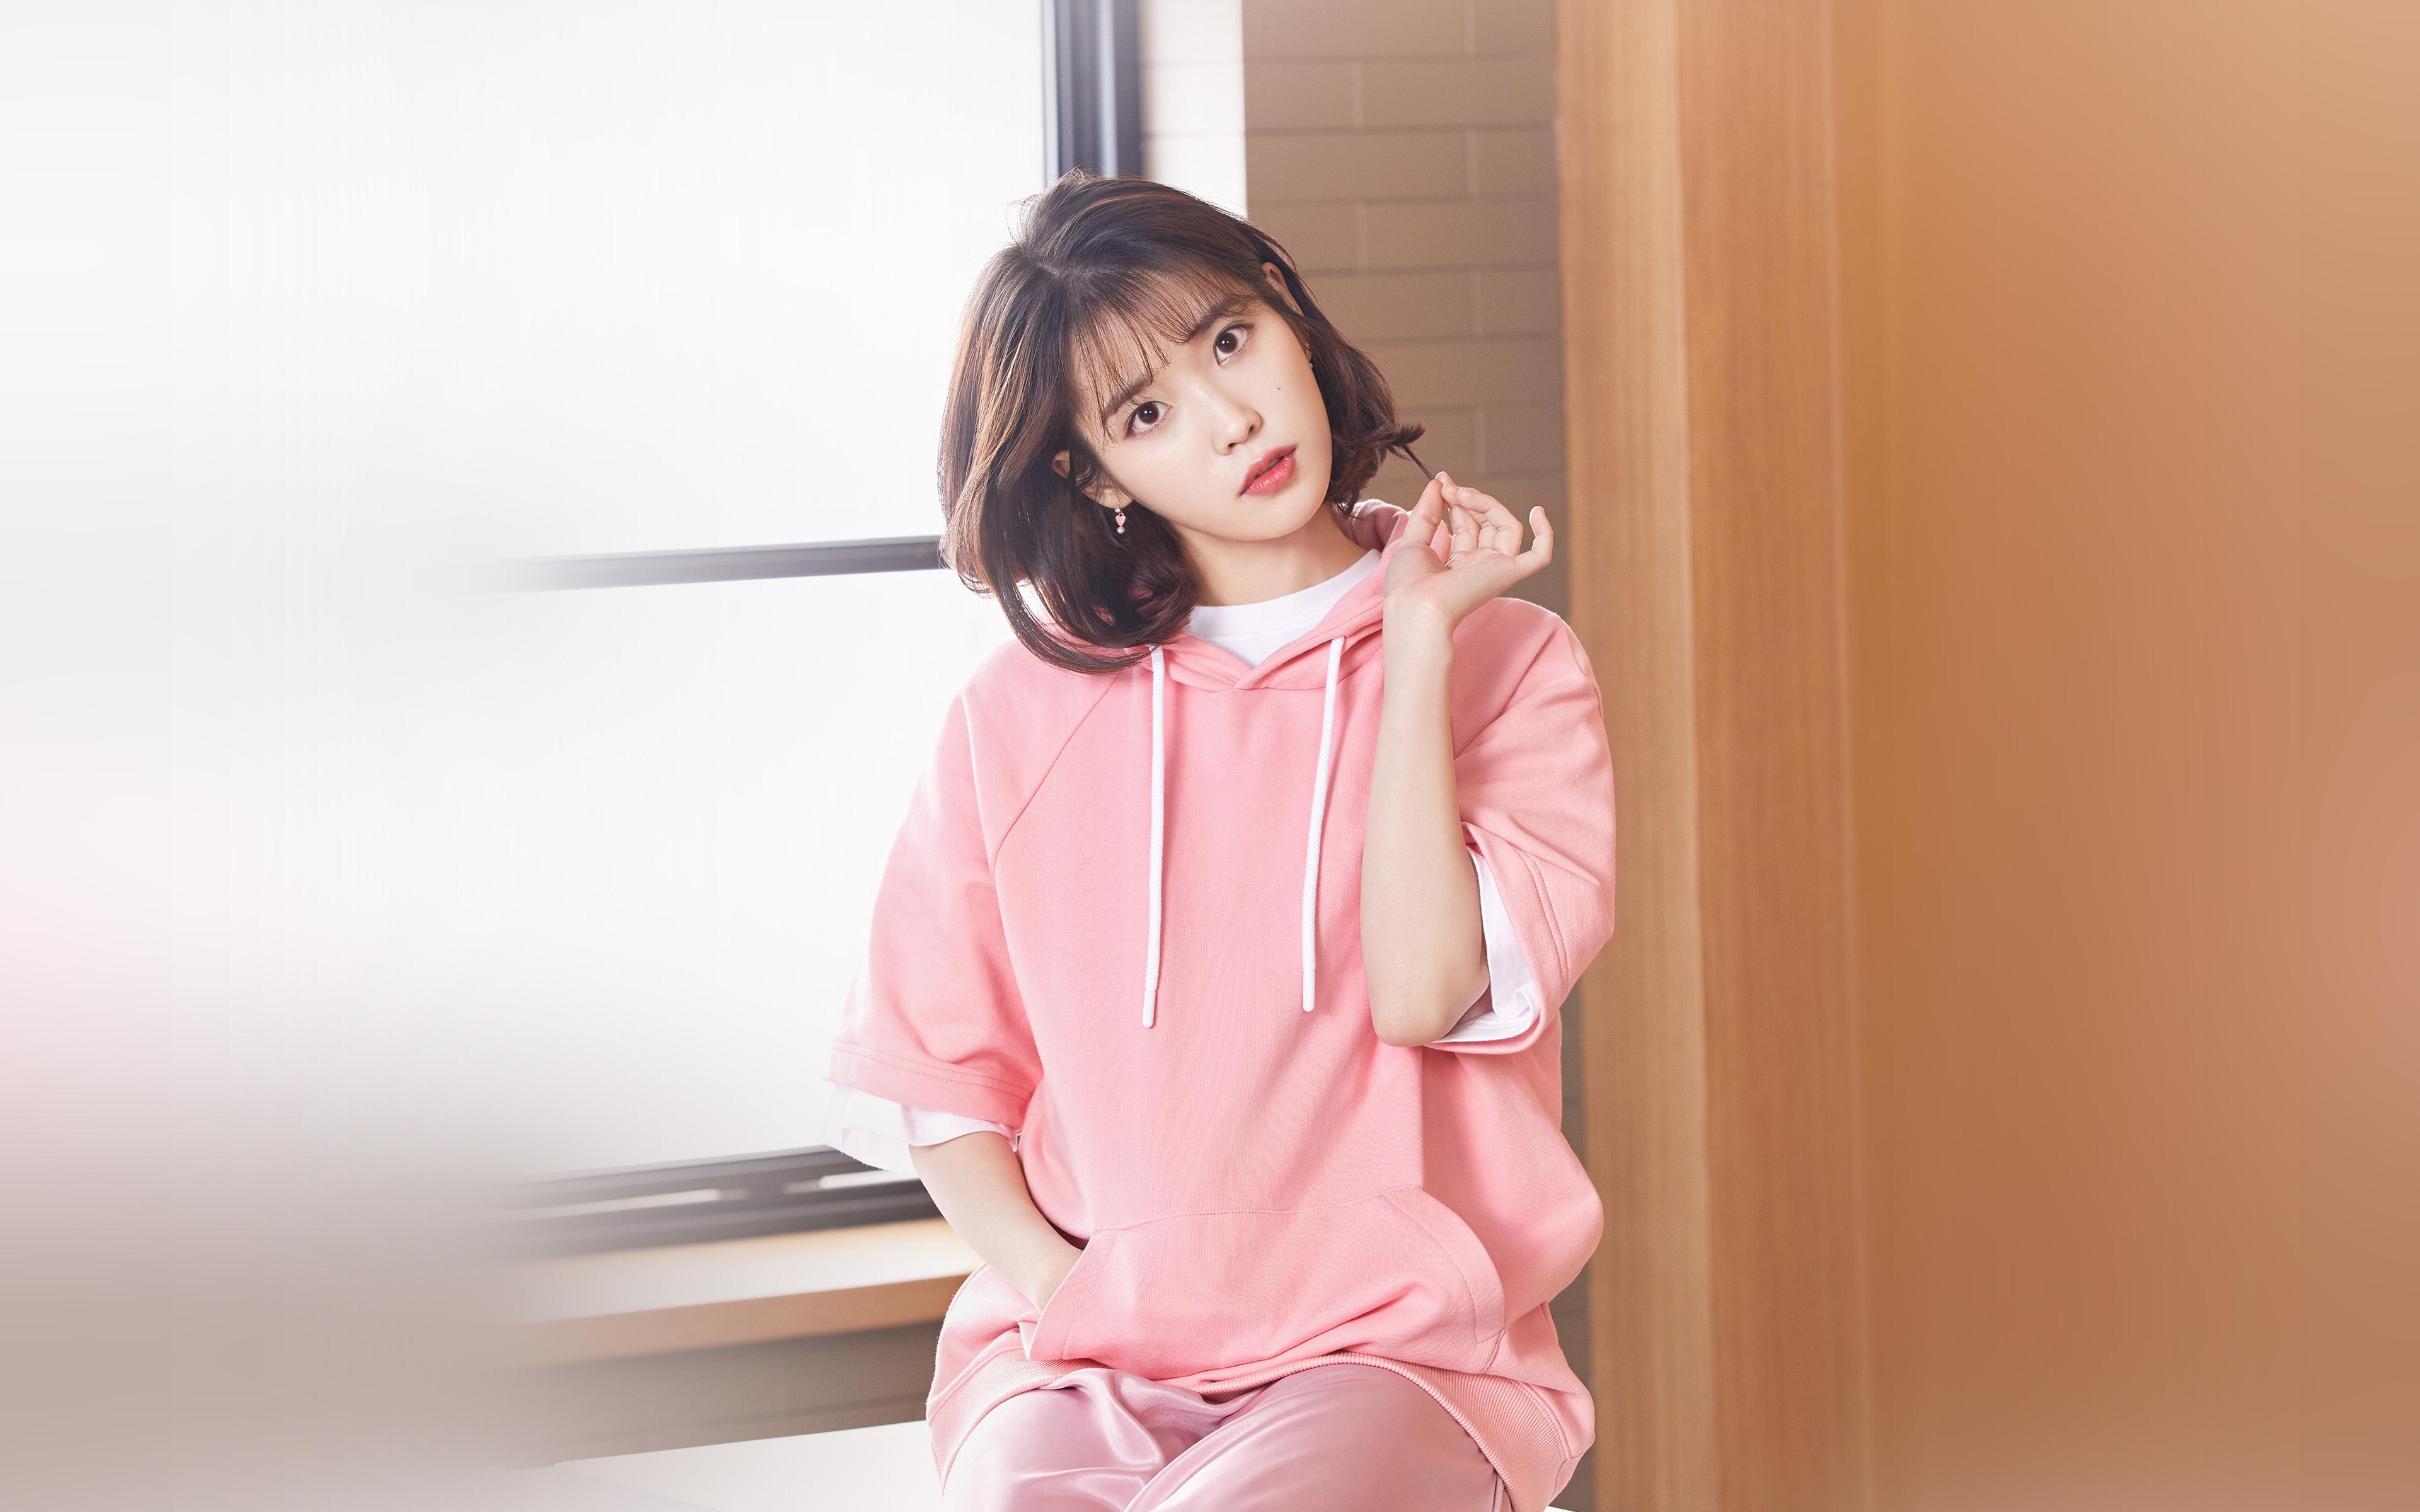 Wallpaper For Desktop Laptop Hq31 Iu Girl Pink Kpop